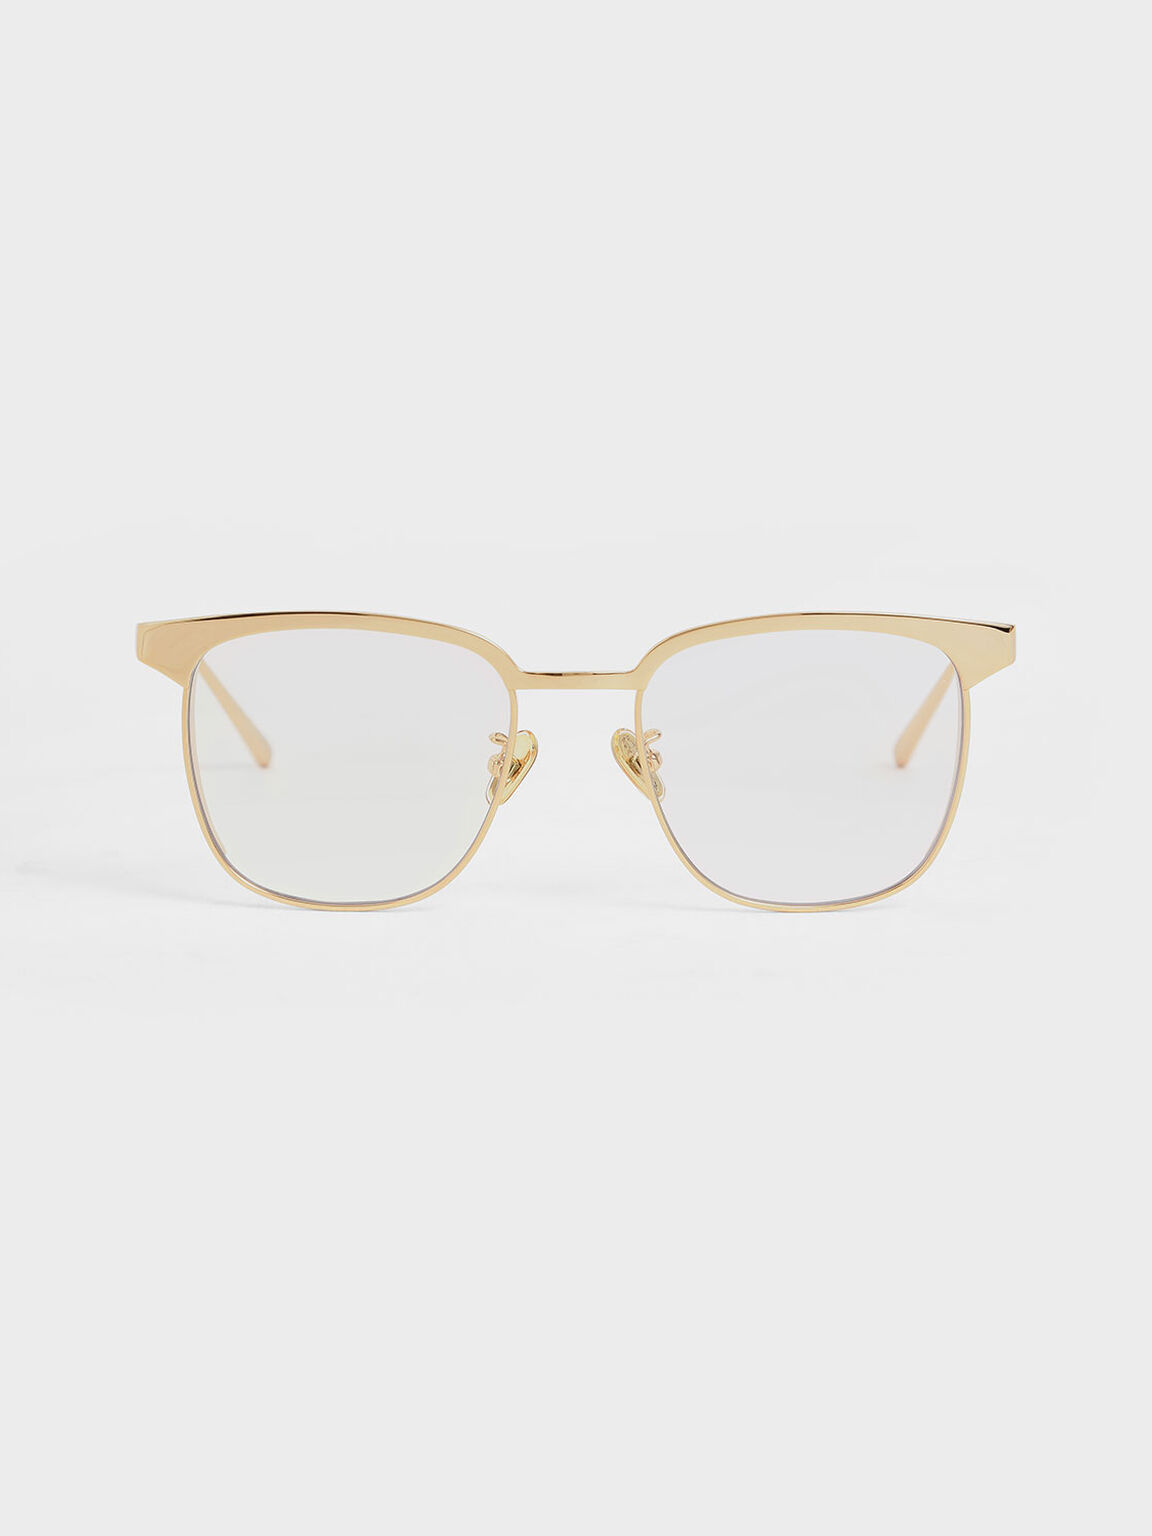 Tinted Rectangular Sunglasses, White, hi-res